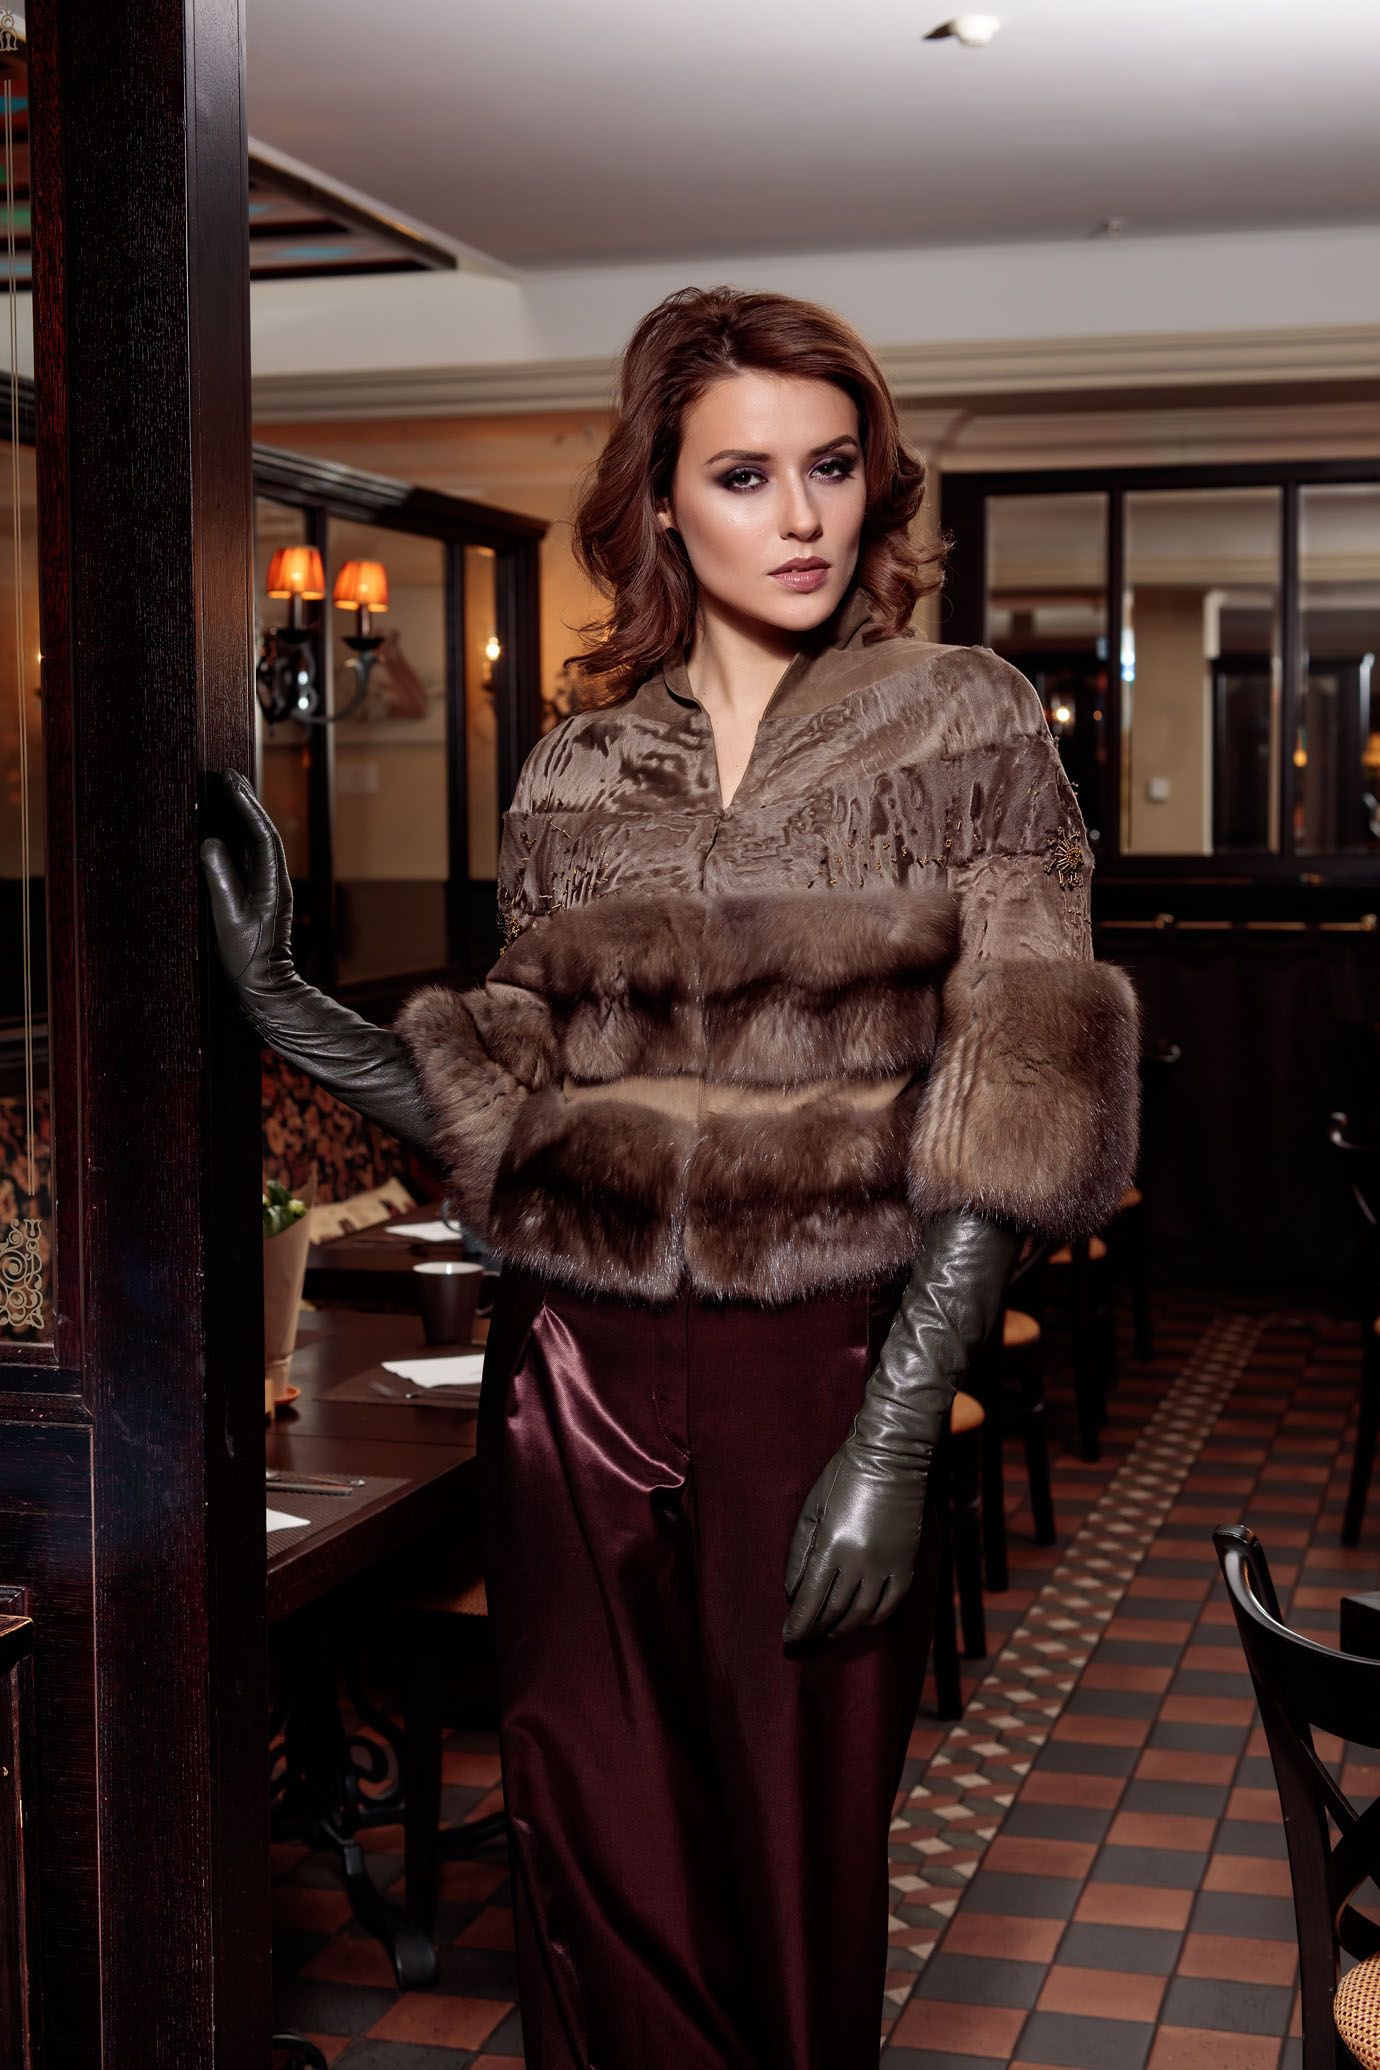 fur and gloves | gloves | Leather gloves, Black leather ...